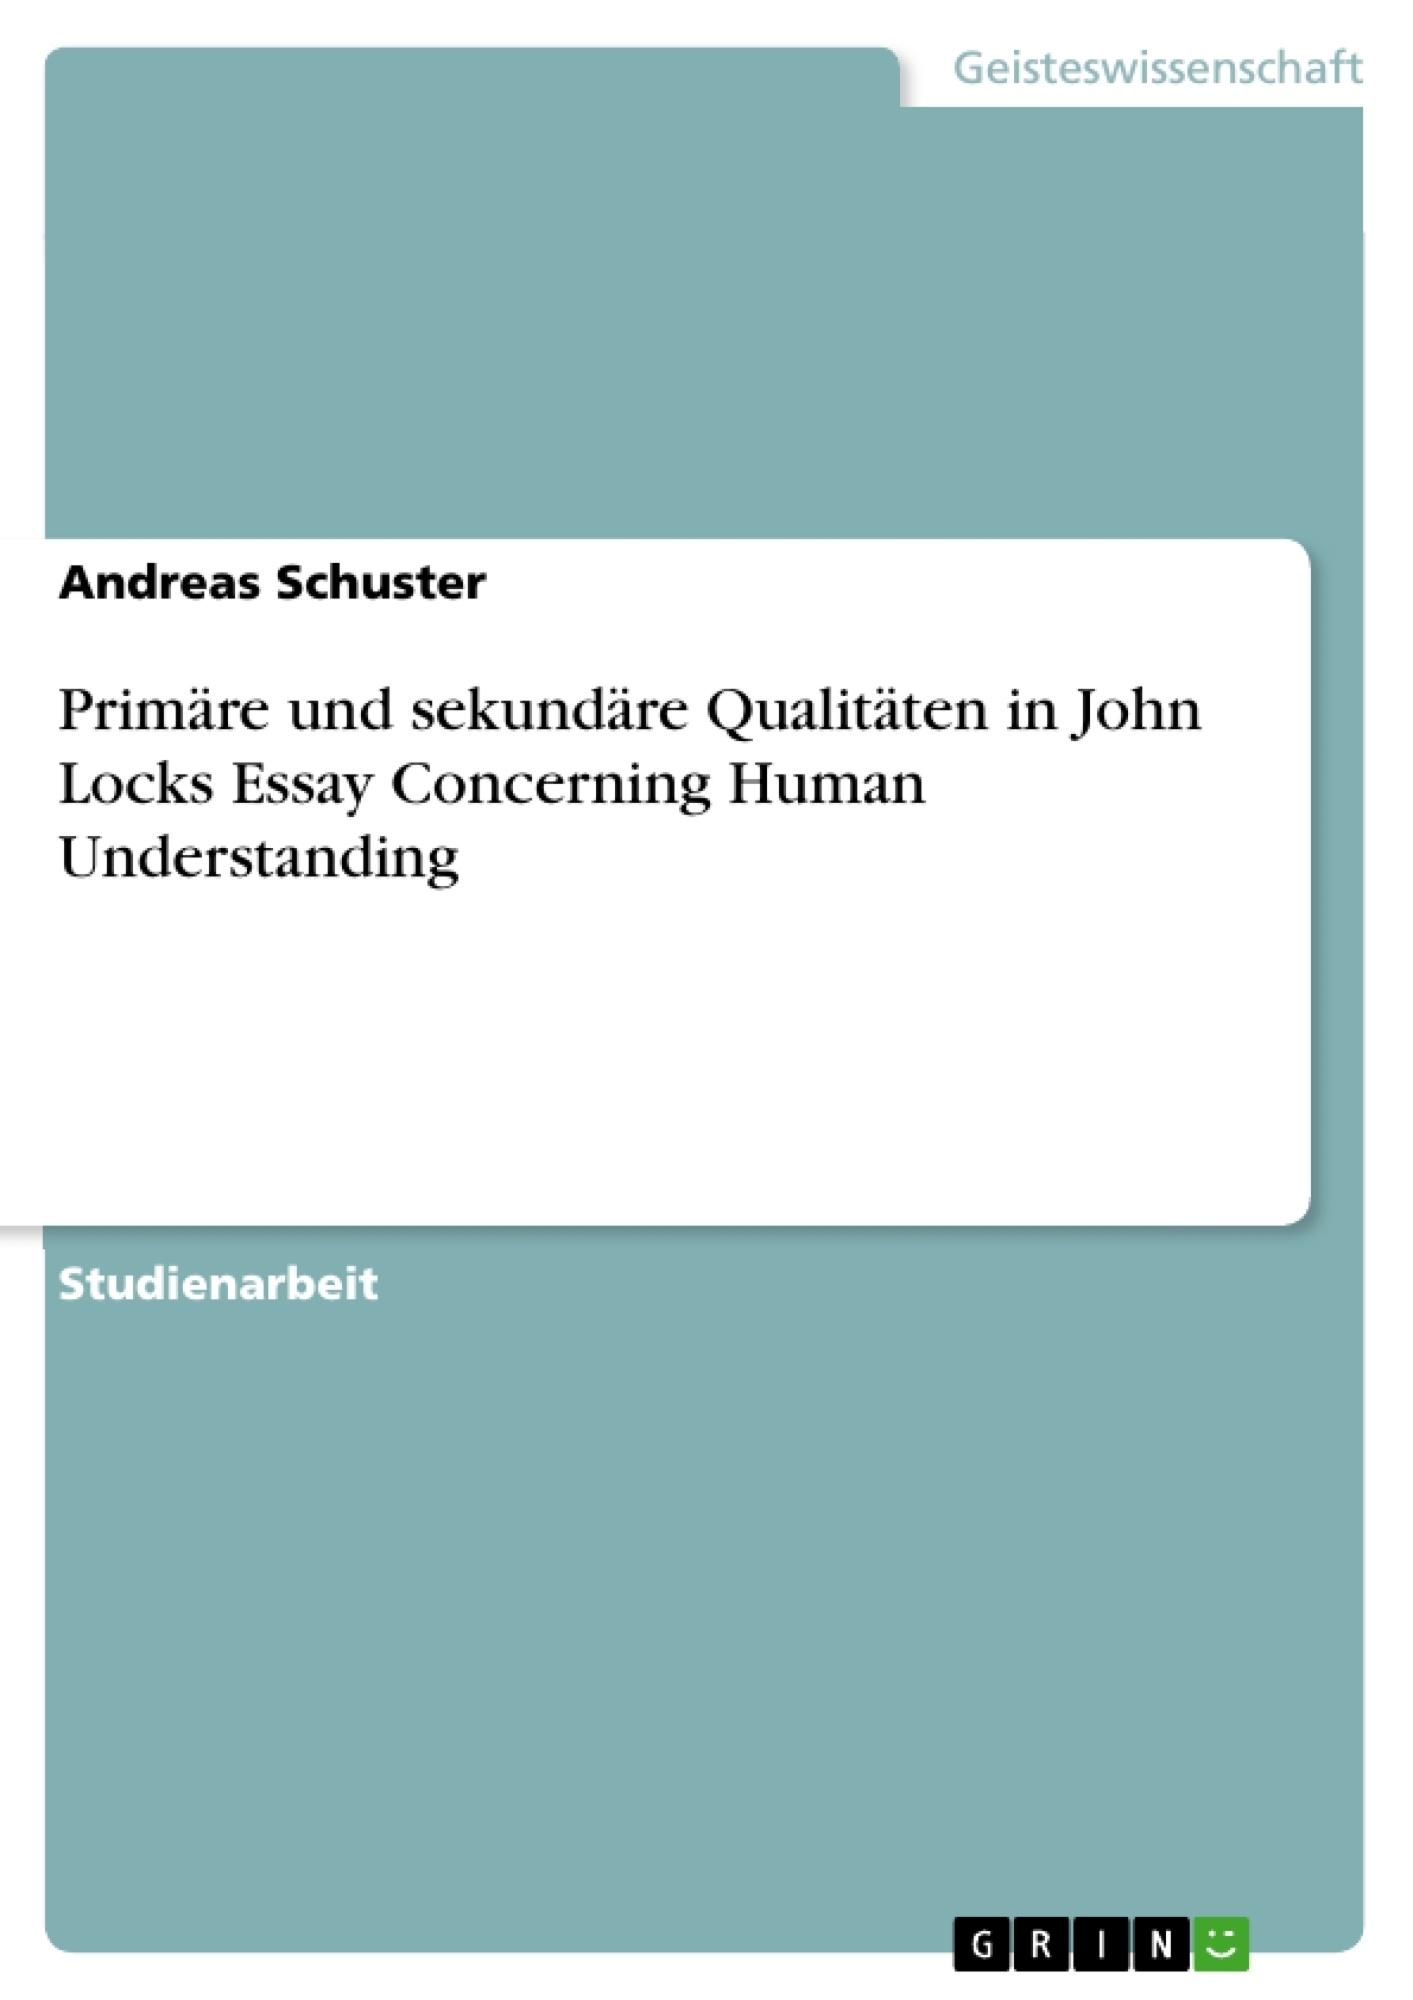 Titel: Primäre und sekundäre Qualitäten in John Locks Essay Concerning Human Understanding